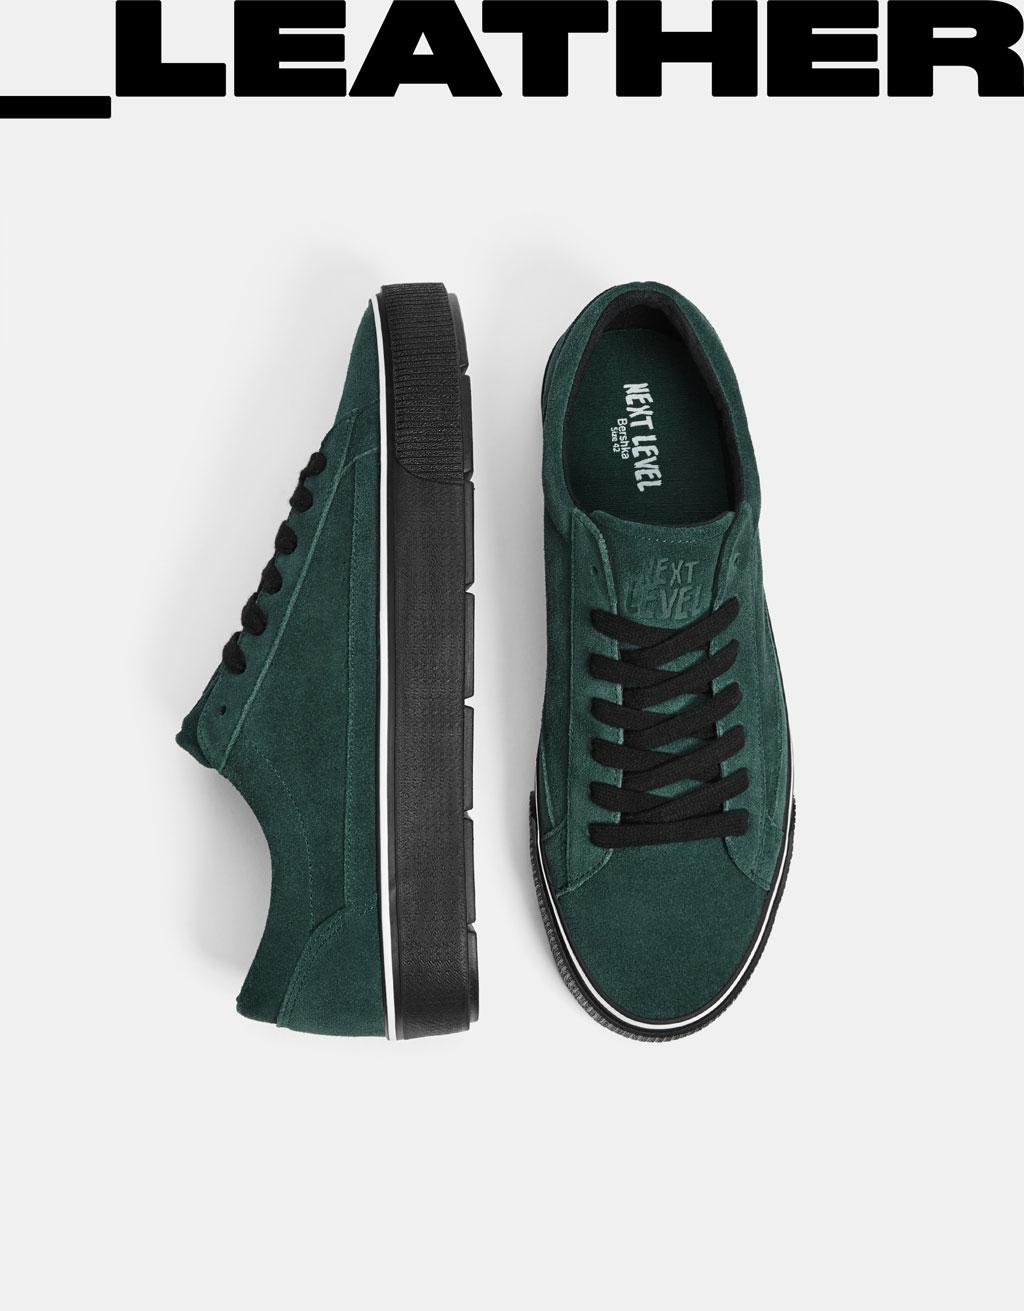 Pánské kožené lehké boty